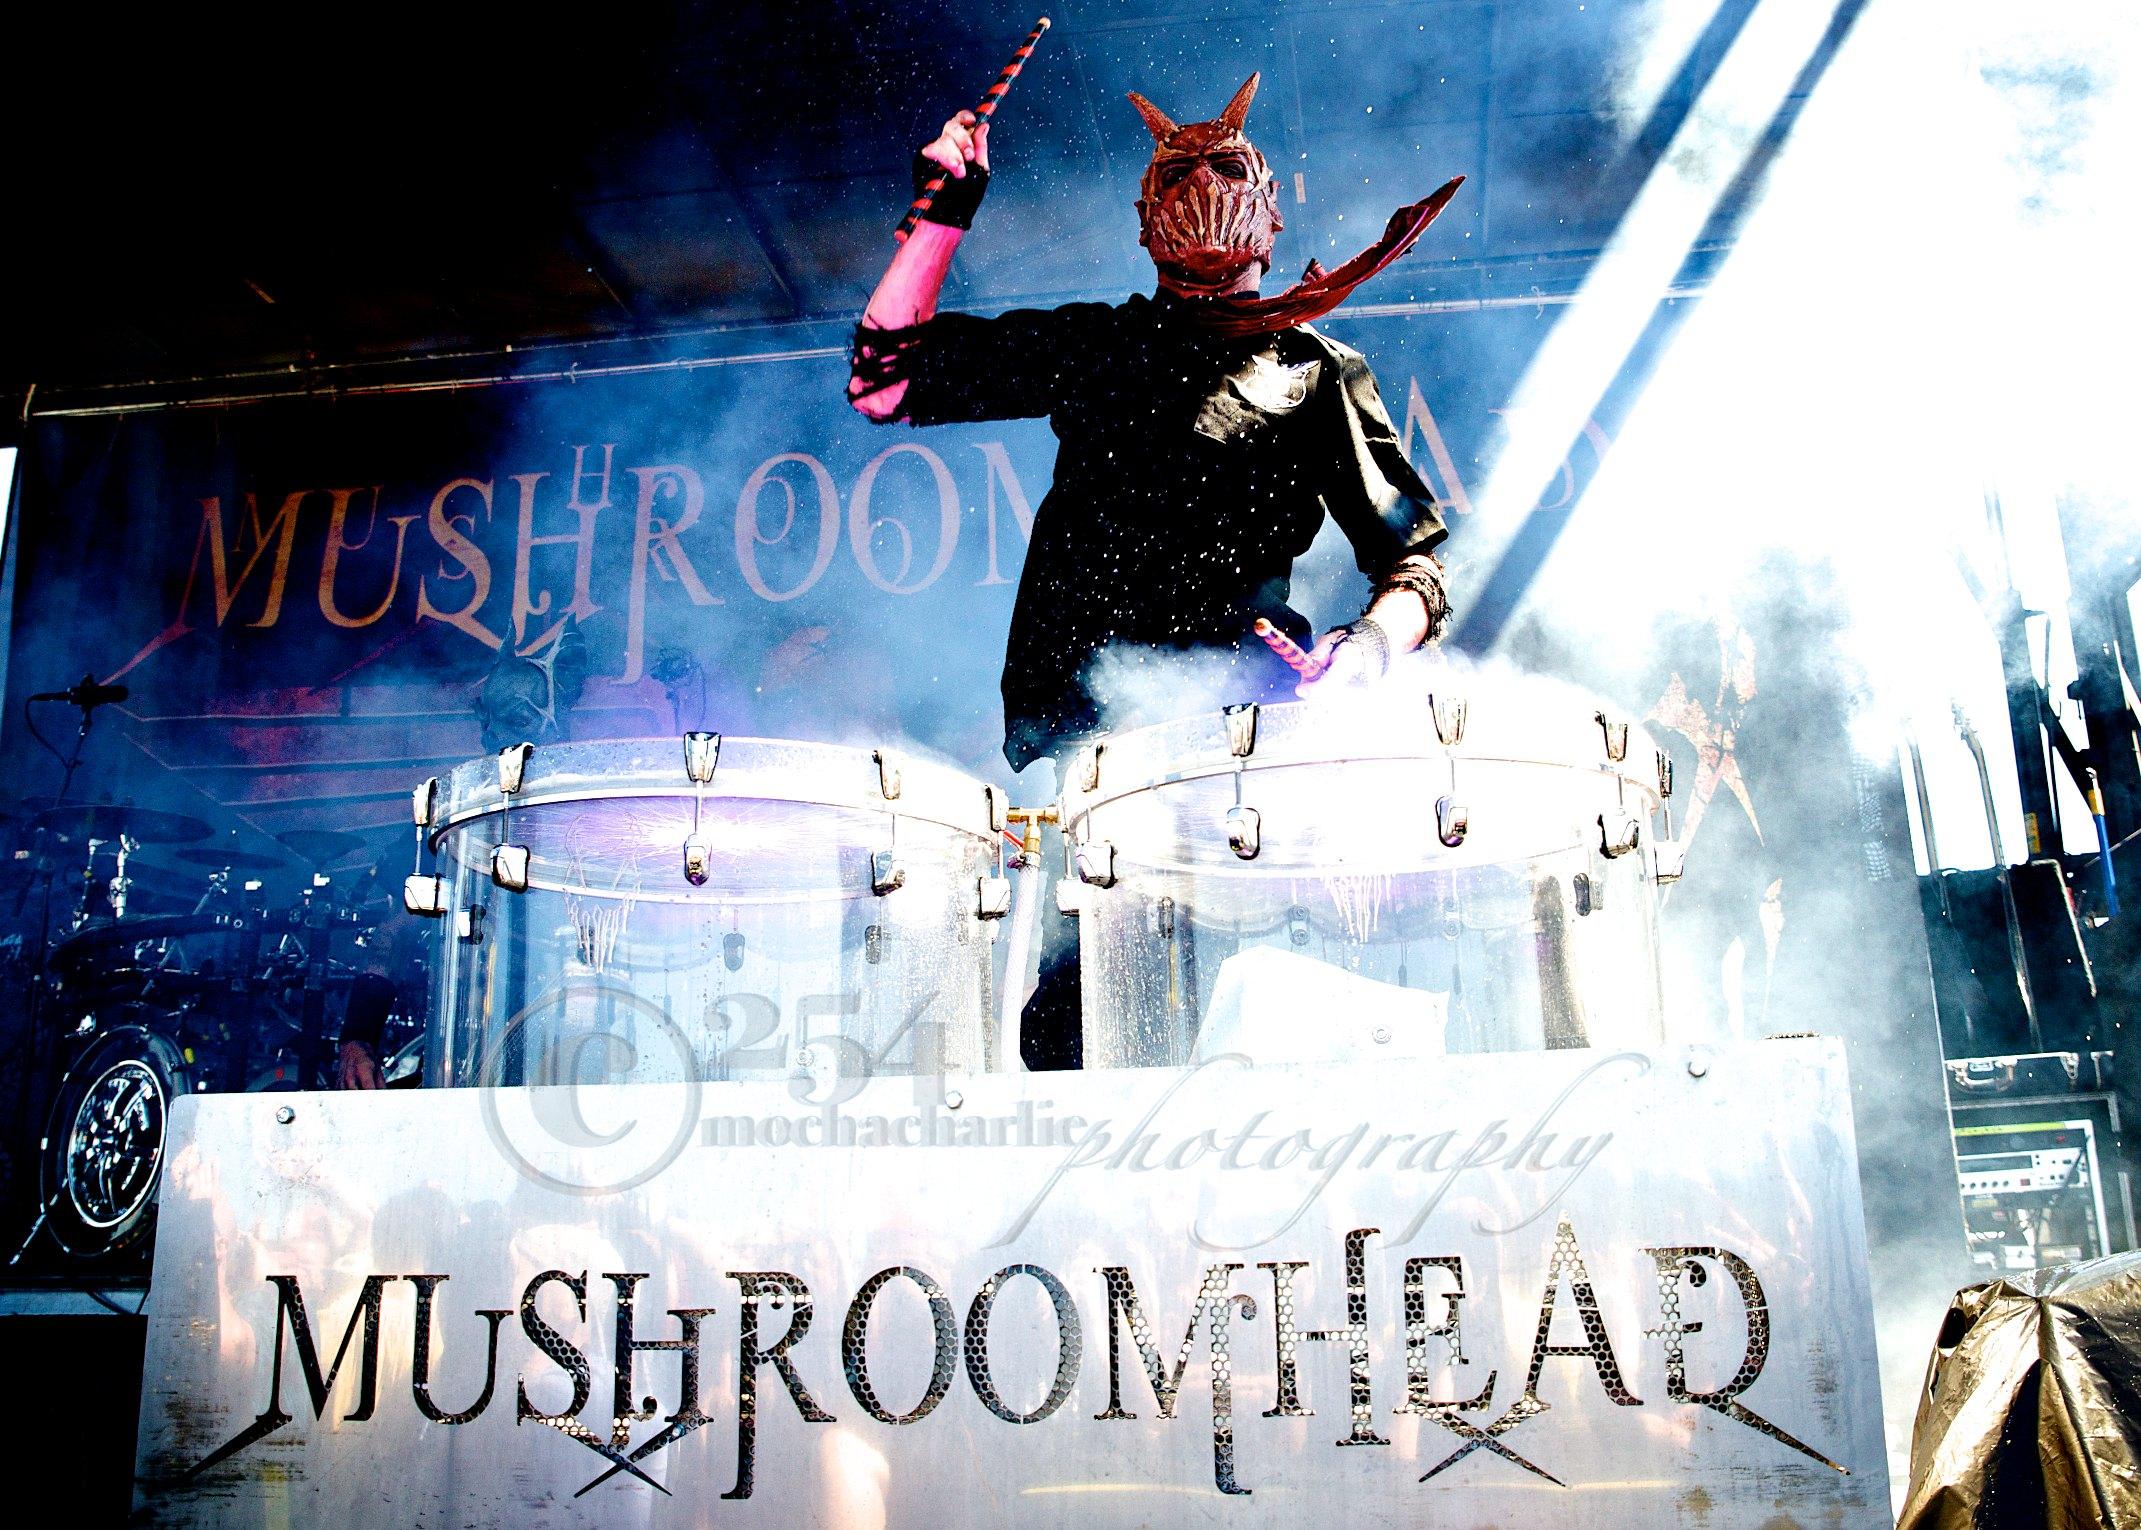 Mushroomhead at Mayhem Festival (Photo by Mocha Charlie)